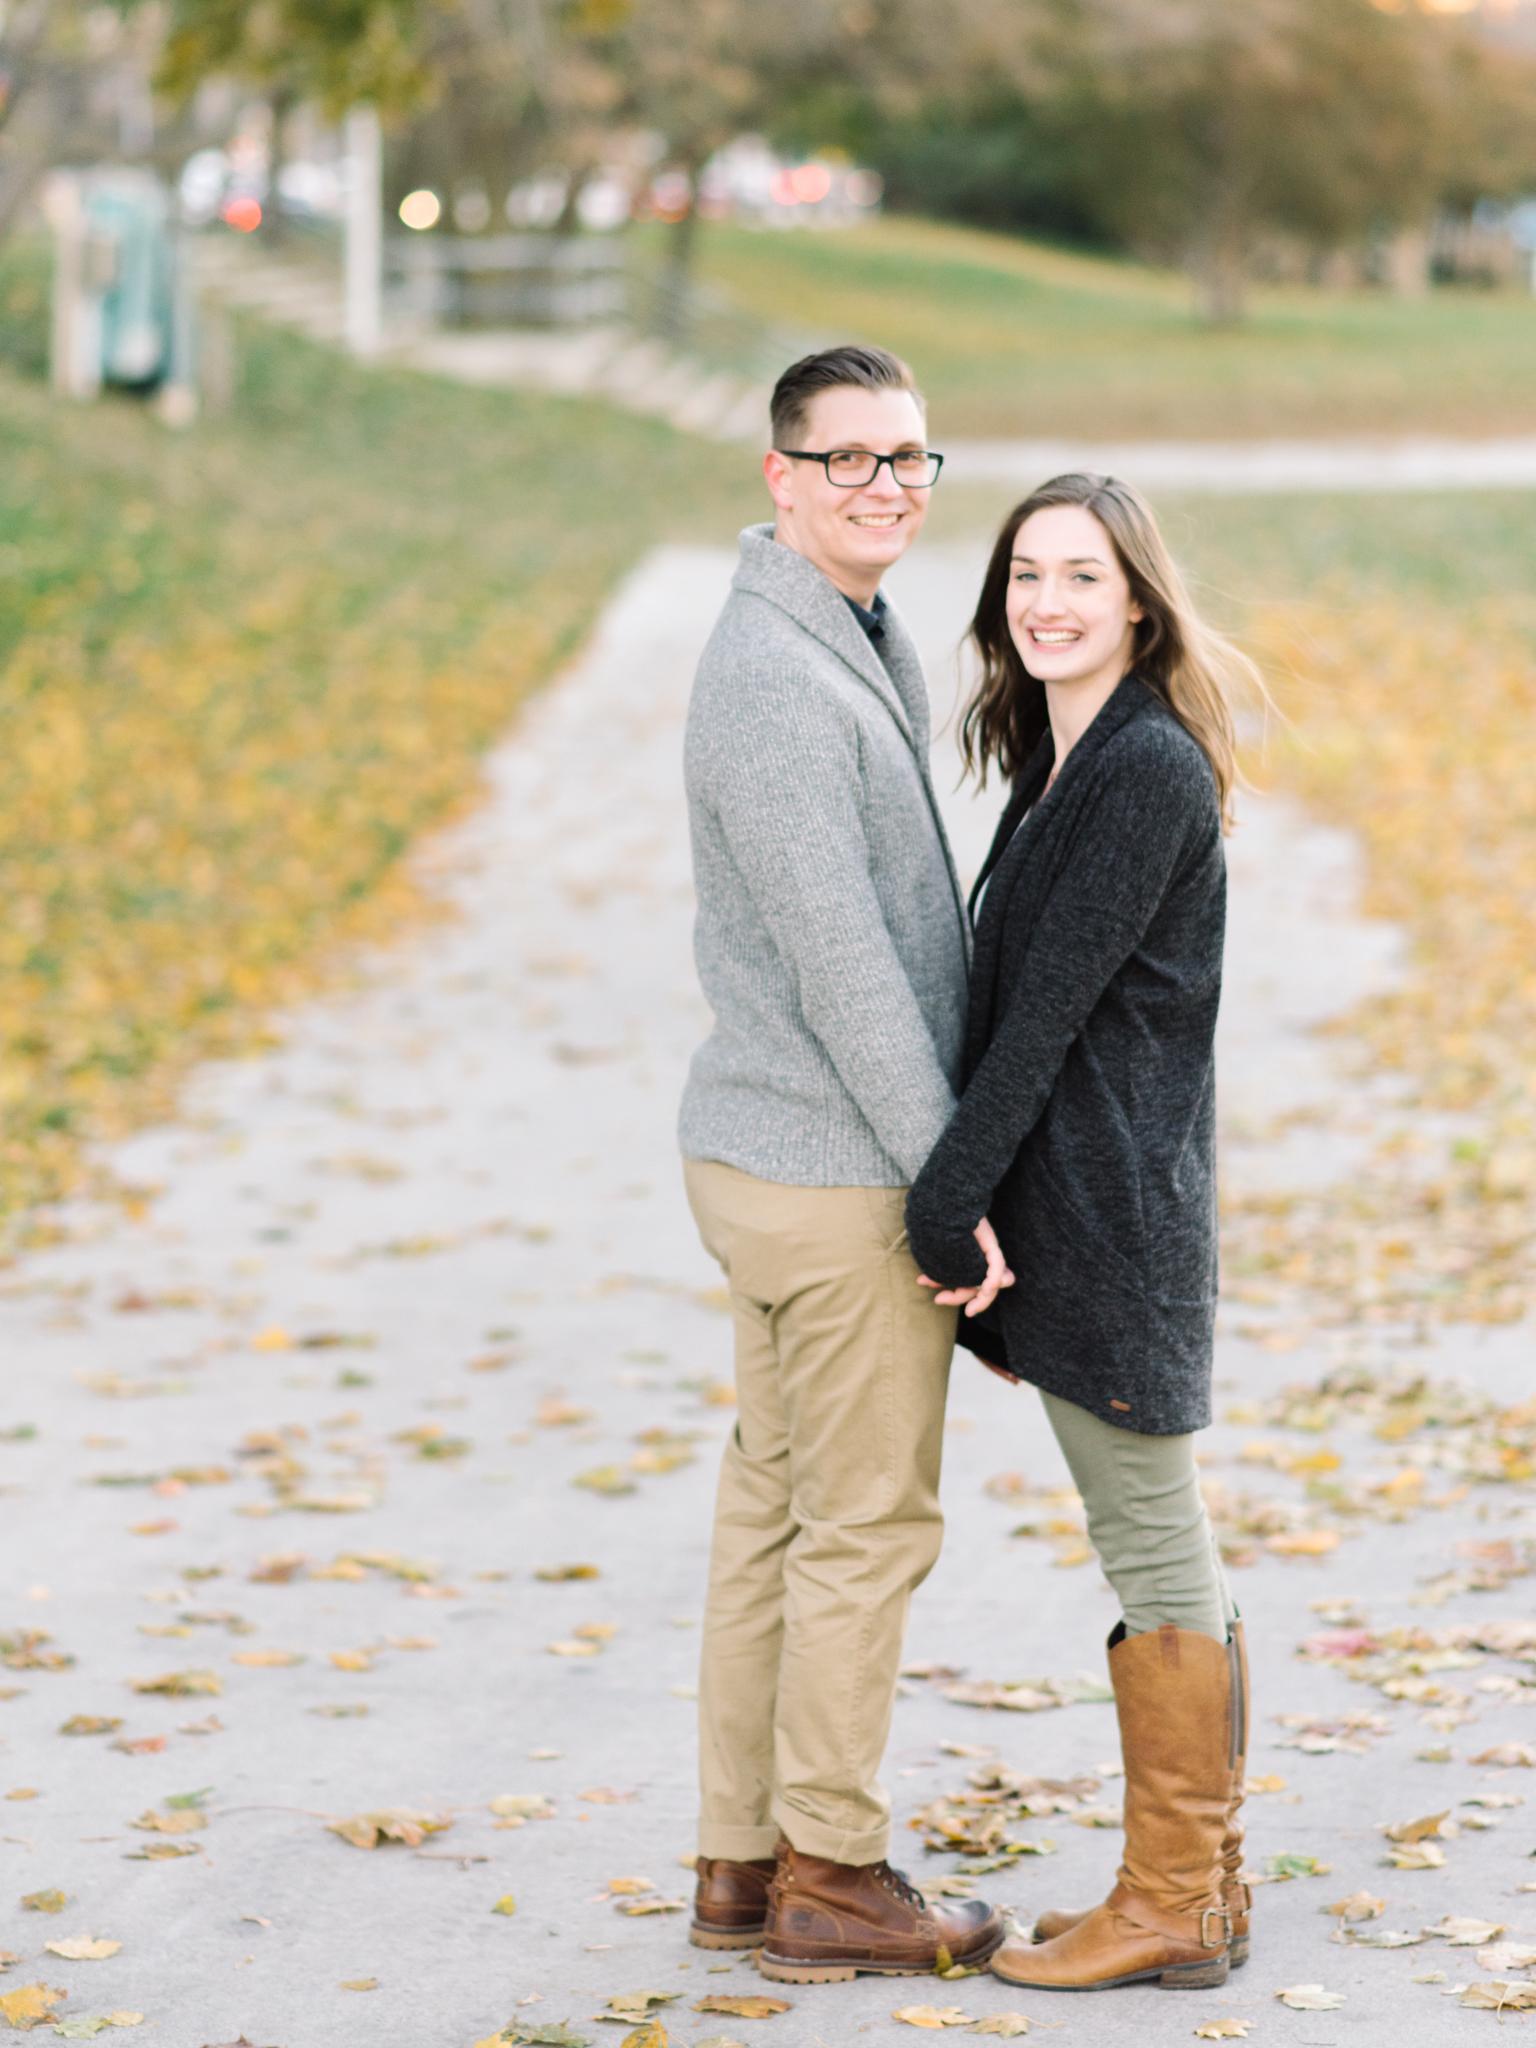 Justine & Mark - Hamilton Wedding Photographer-12.jpg